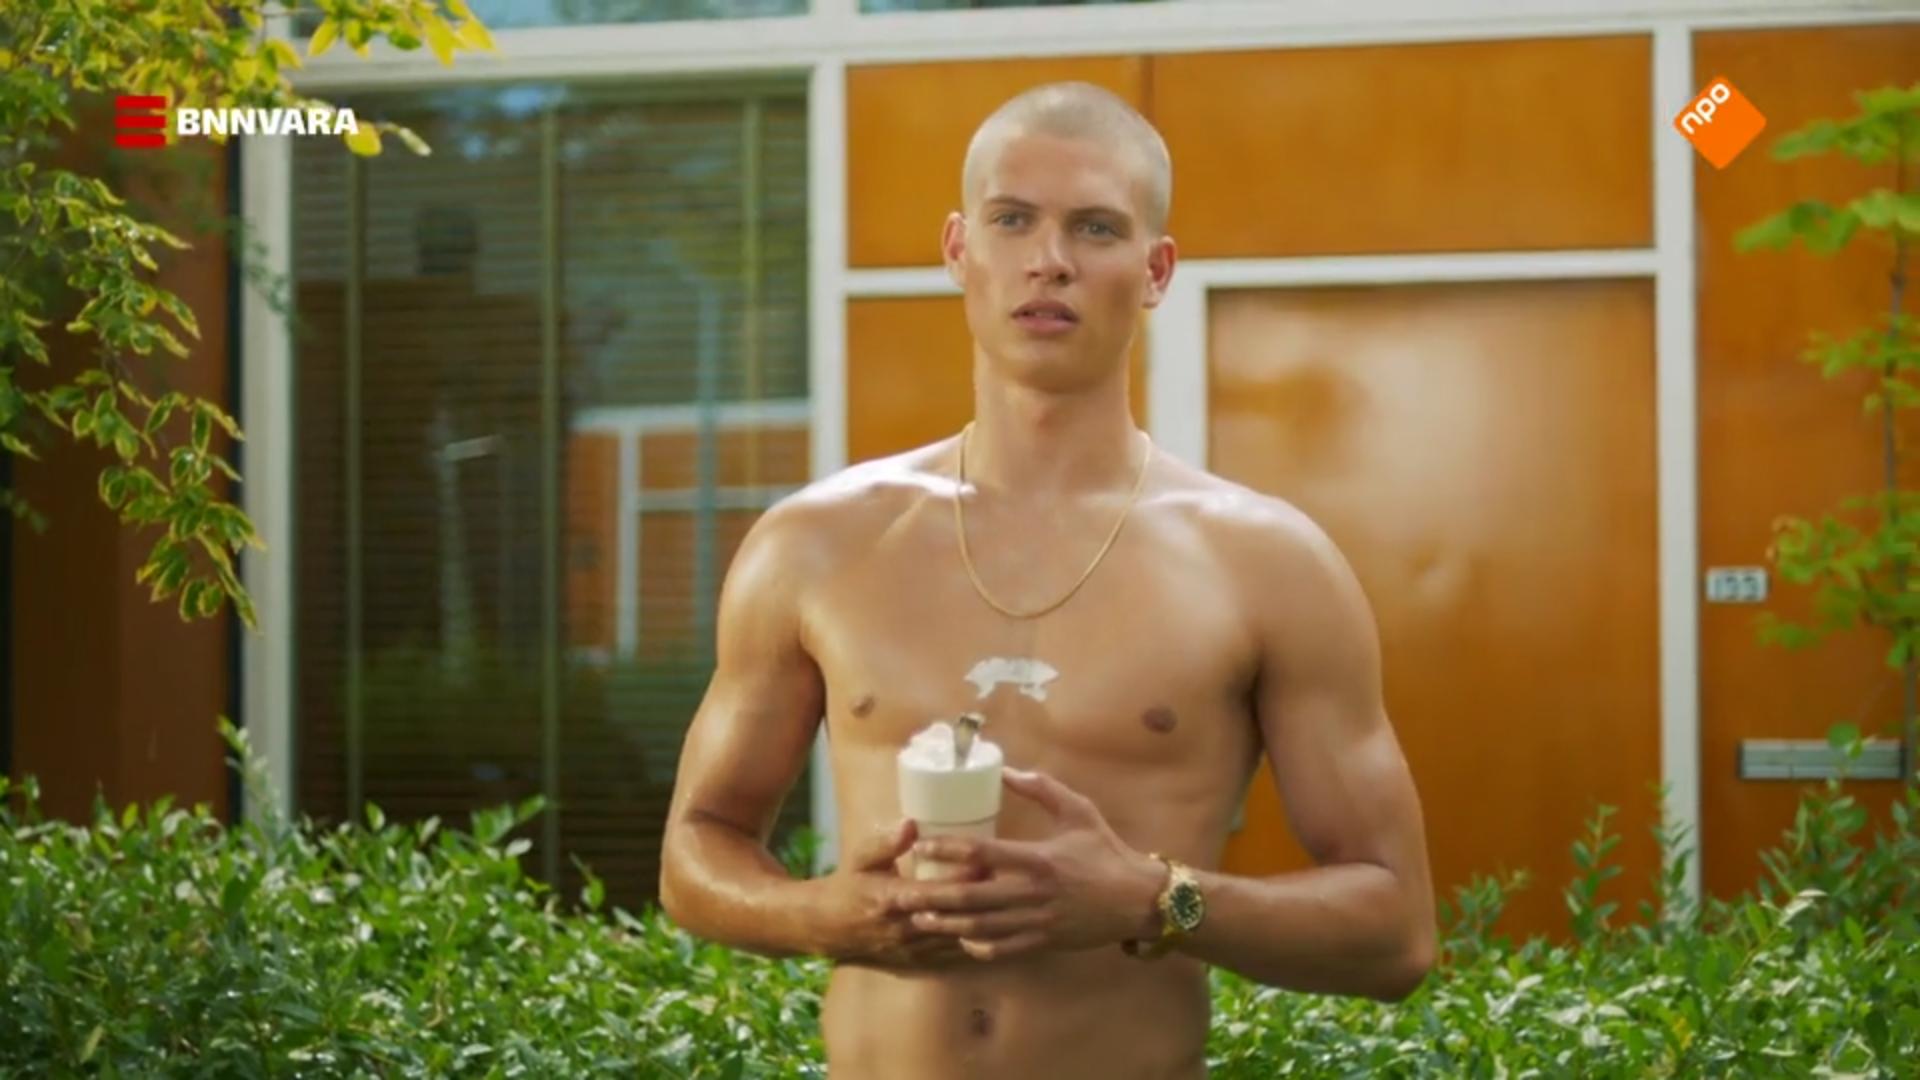 Josha Stradowski as Joris in Dutch young gay romance, Gewoon Vrienden